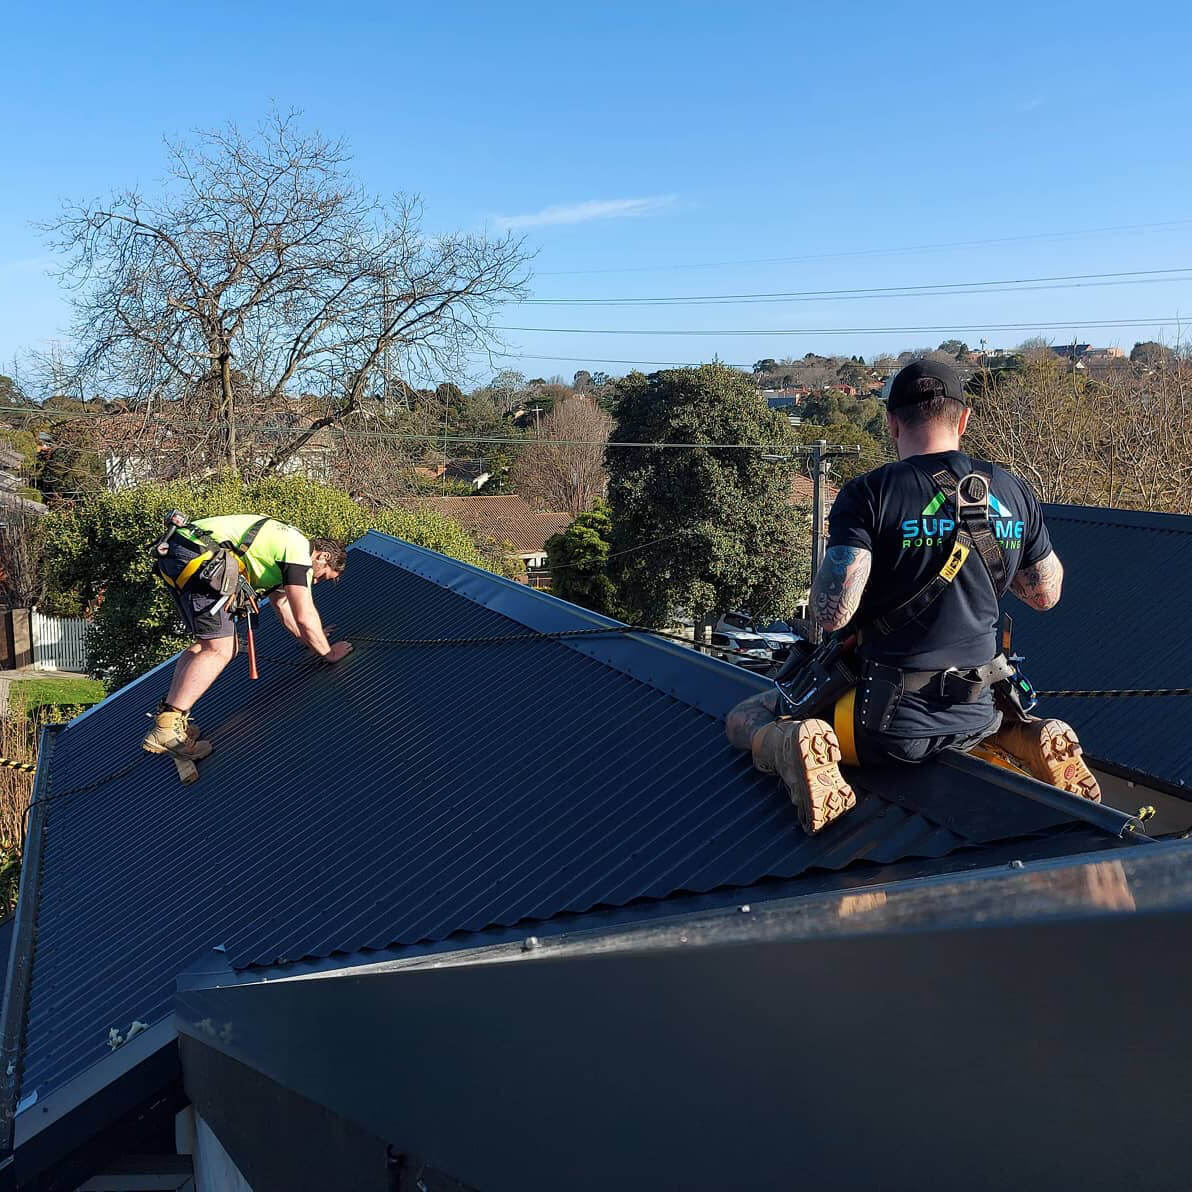 Supreme Roof Plumbing Instagram Image